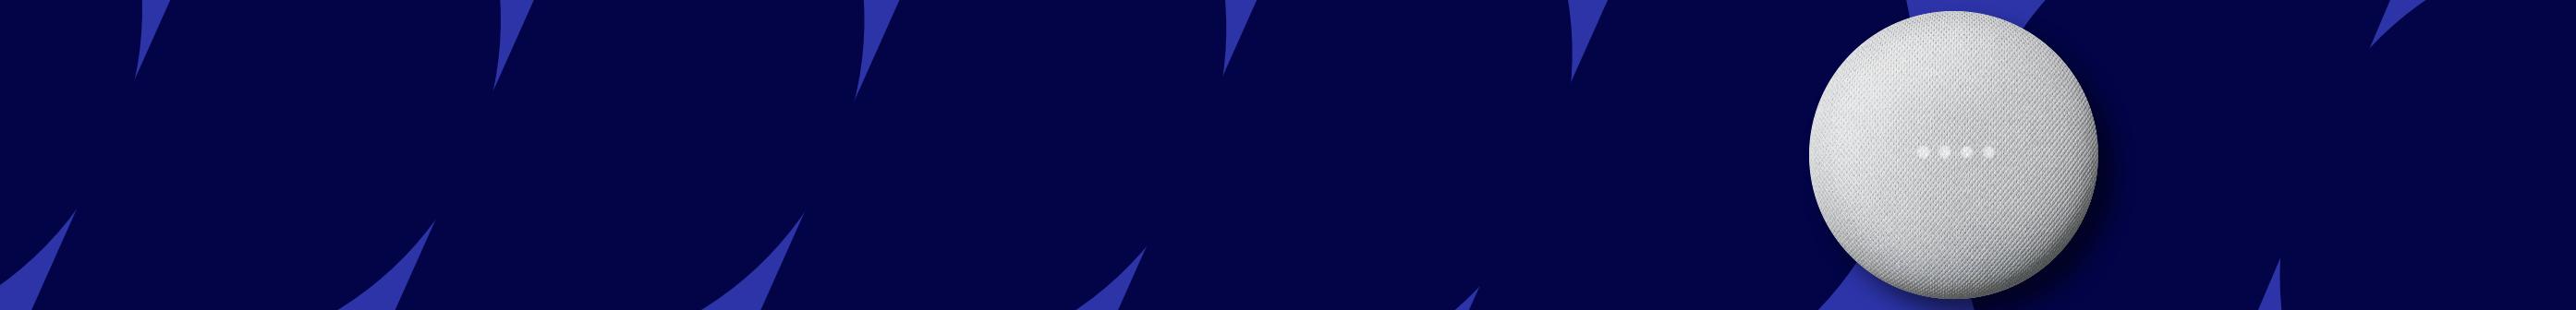 CDI-Blog-banner-small@2x